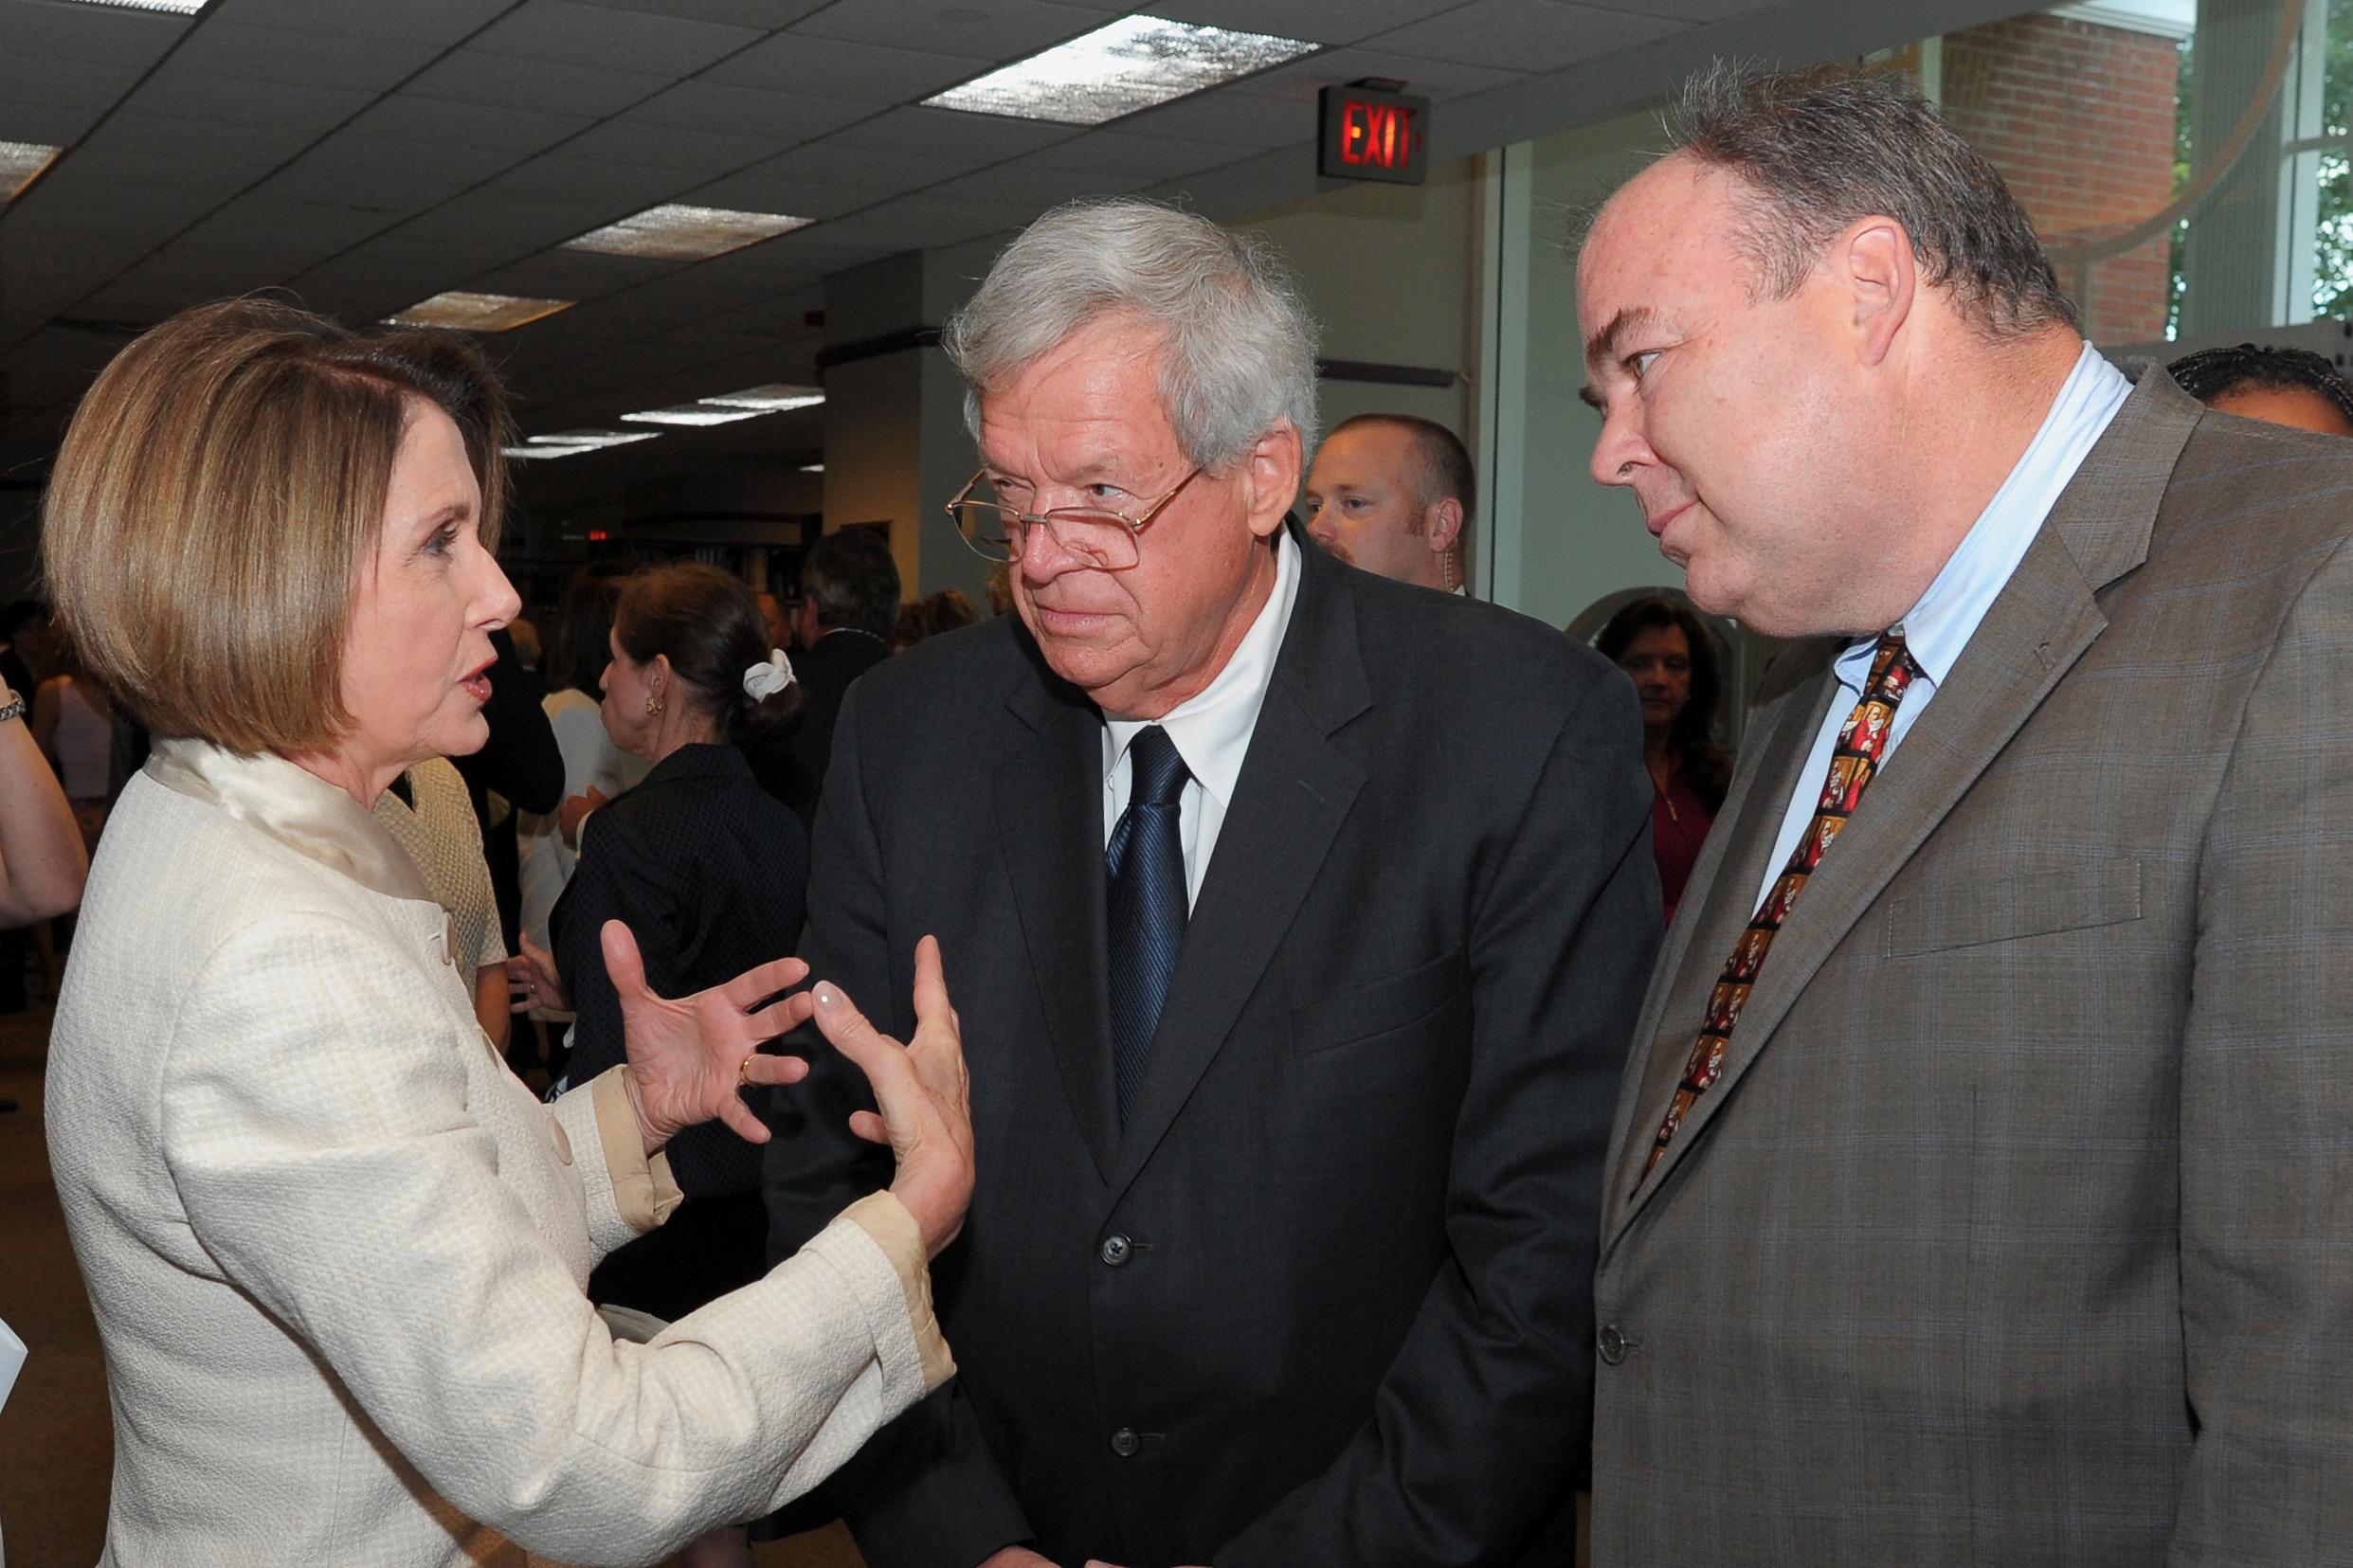 Pelosi, Hastert & Cavanaugh